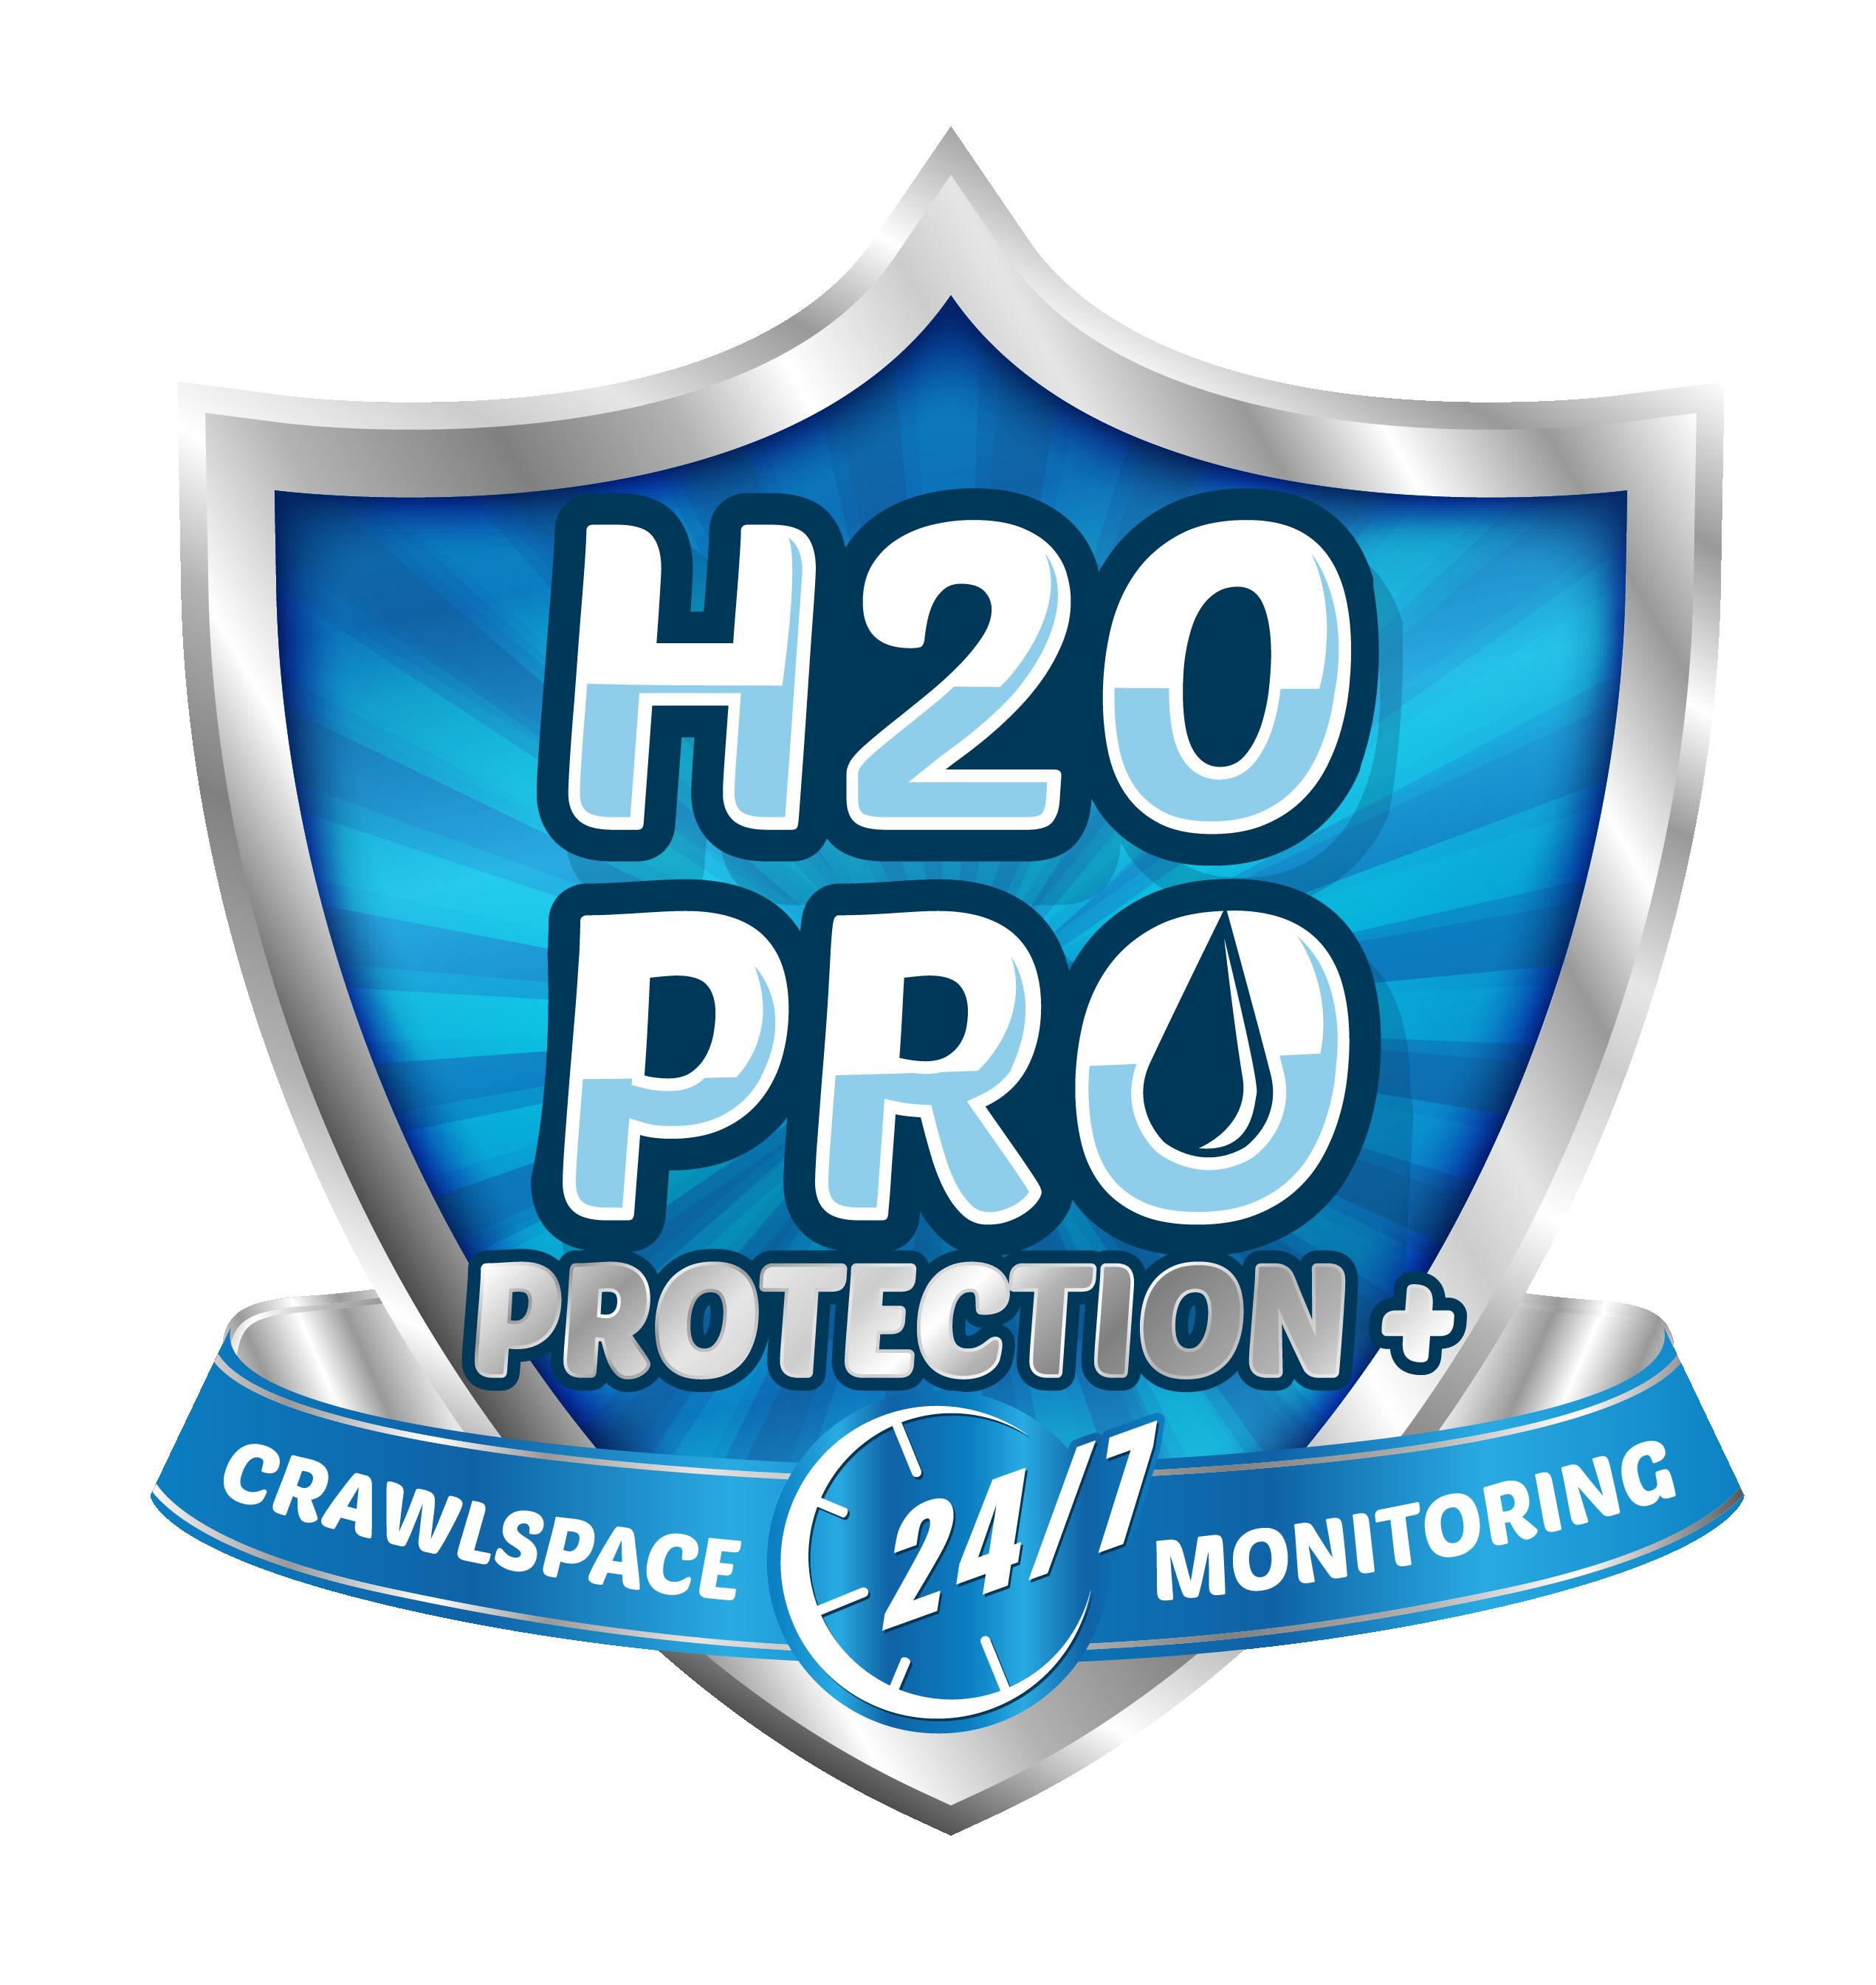 H2O PRO - PROTECTION PLUS